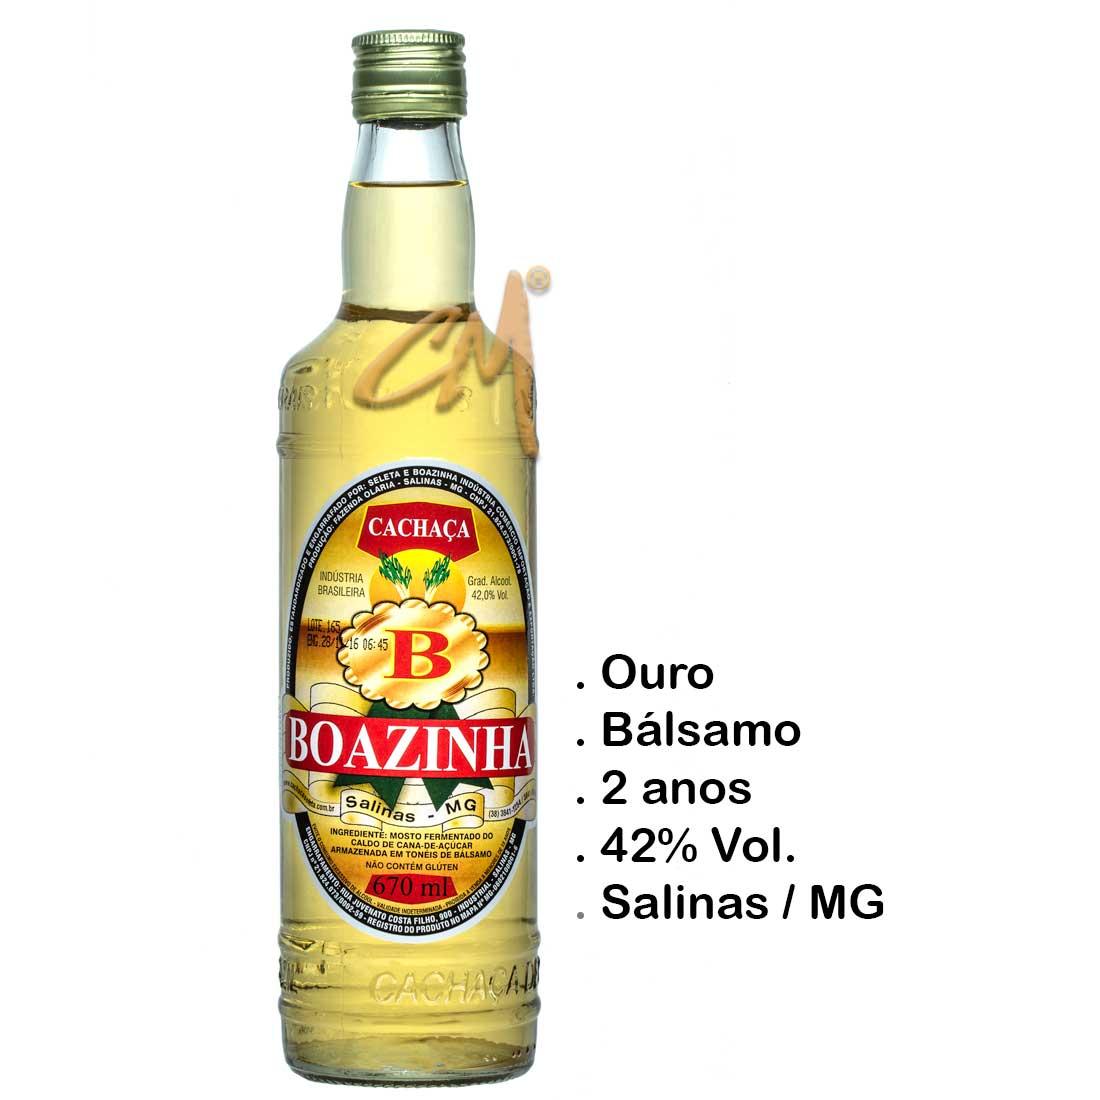 Cachaça Boazinha 670 ml (Salinas - MG)